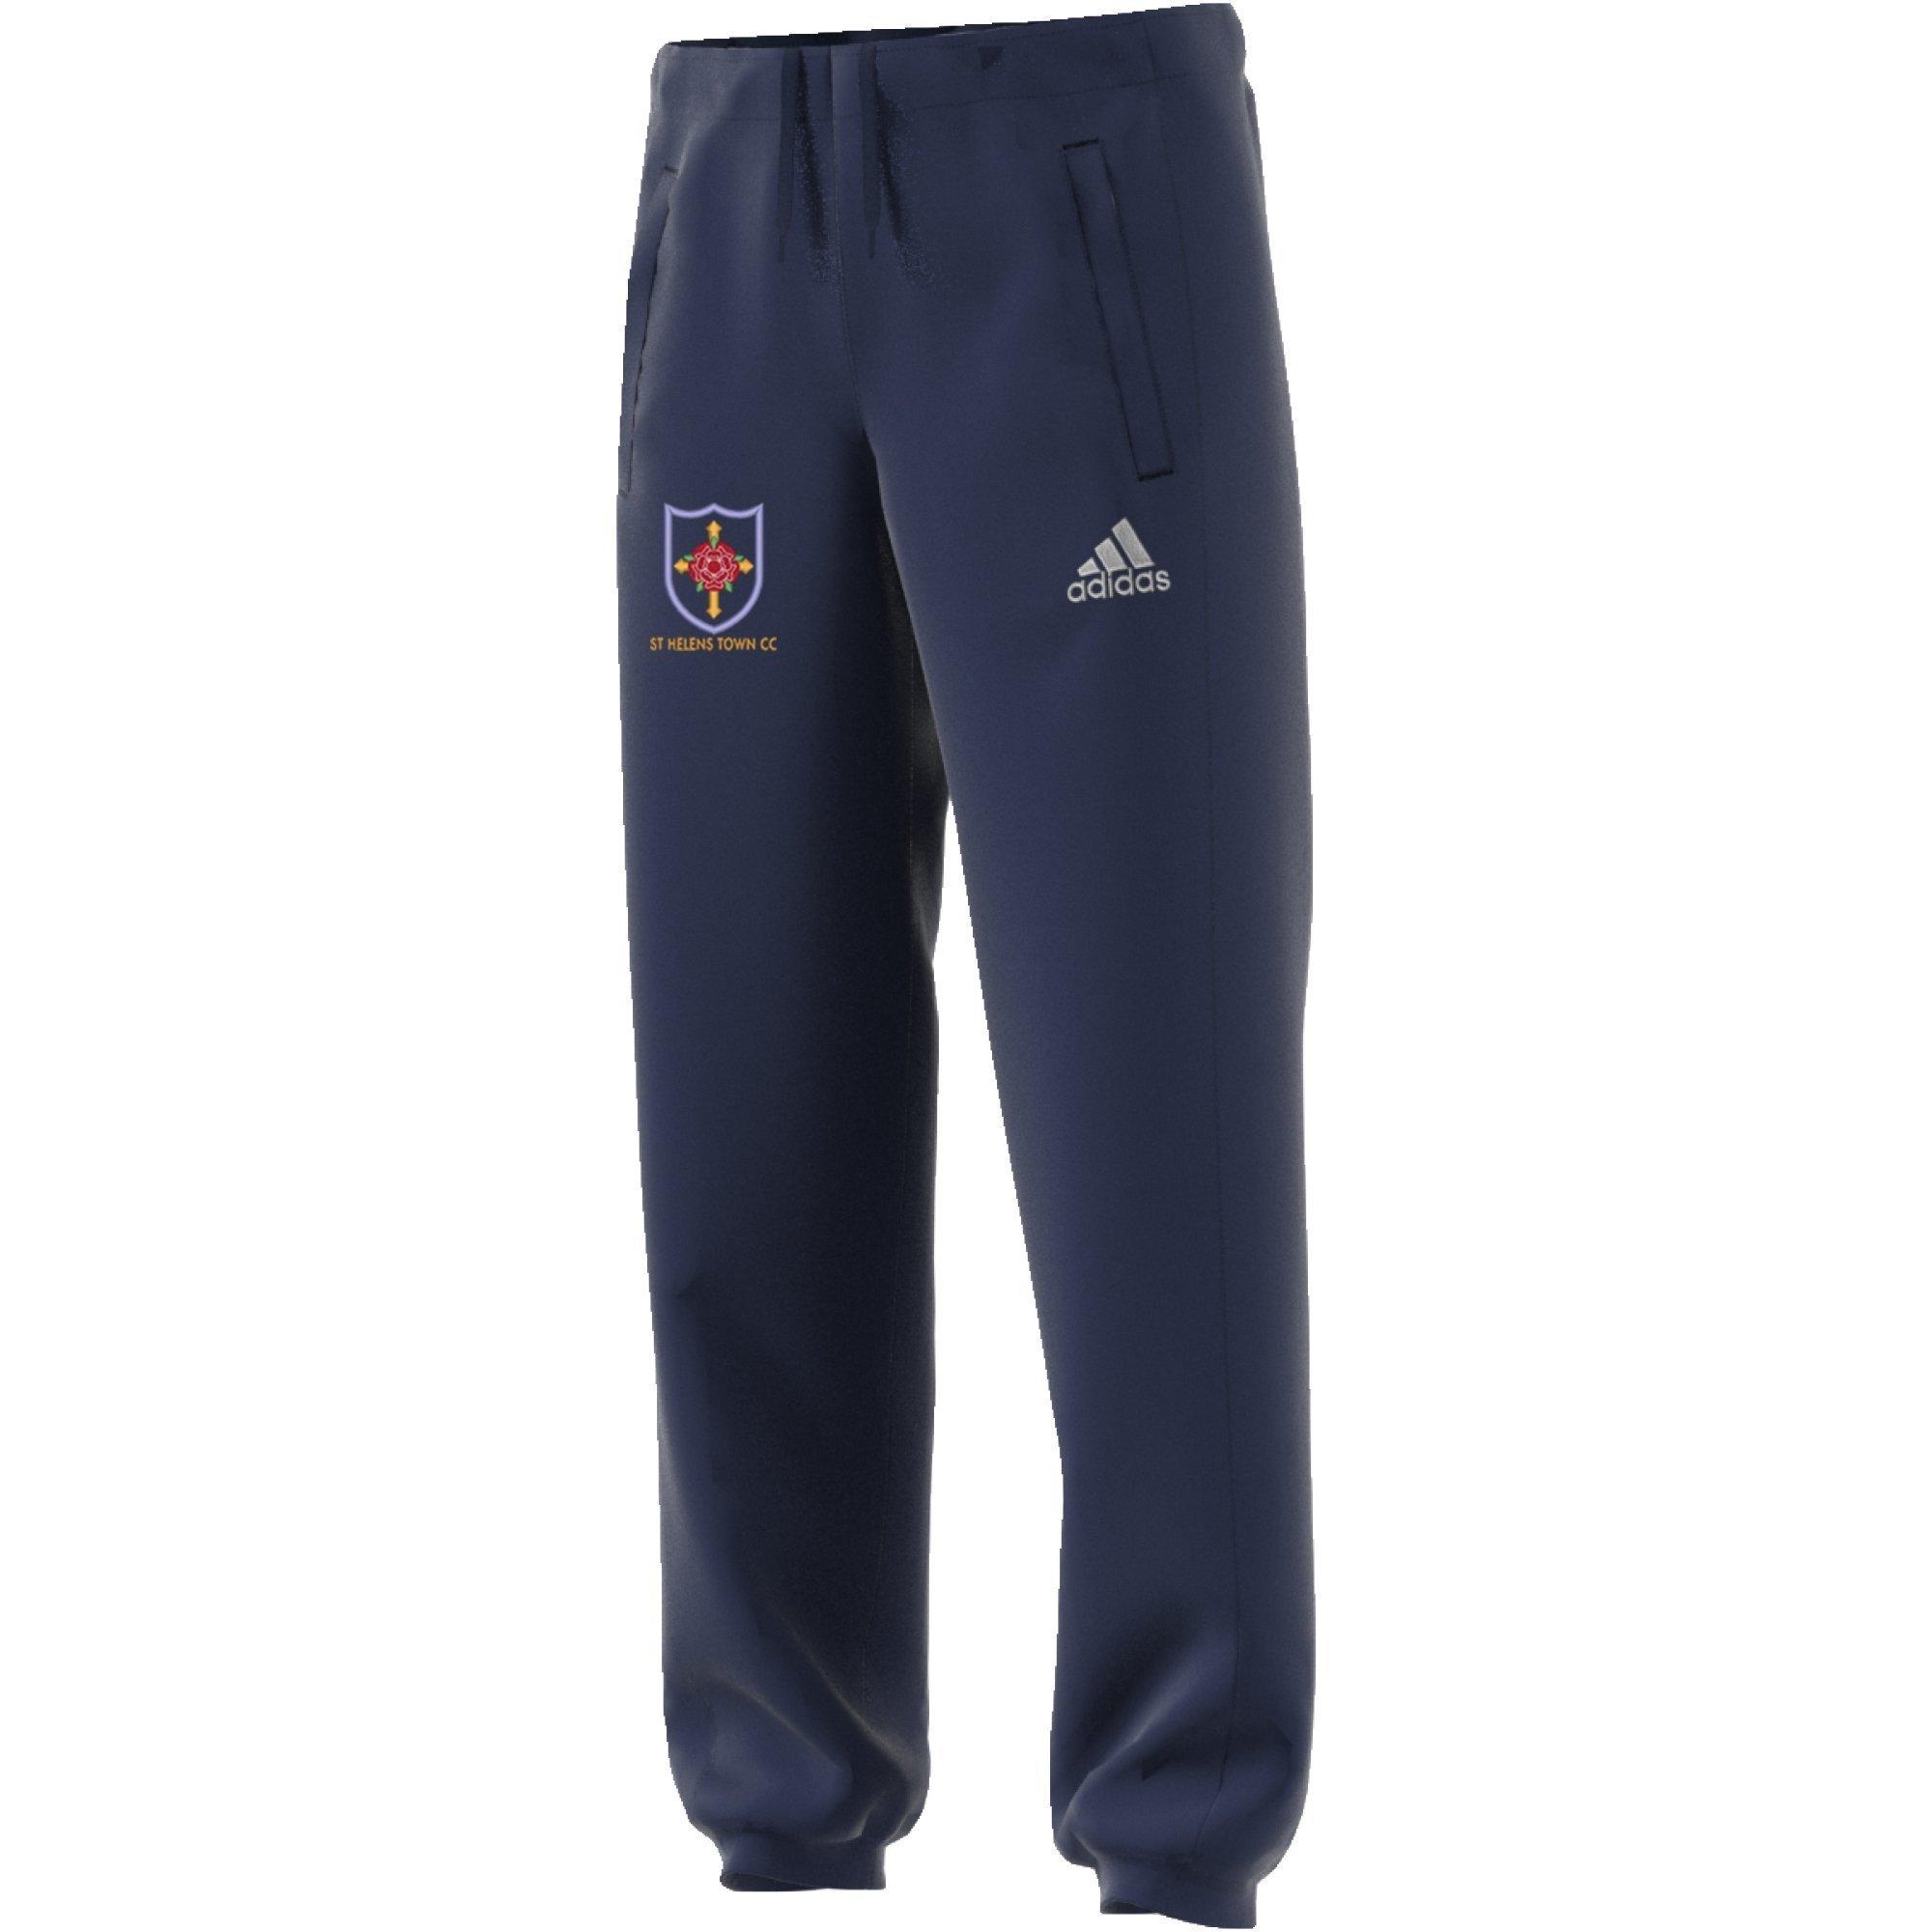 St Helens Town CC Adidas Navy Sweat Pants